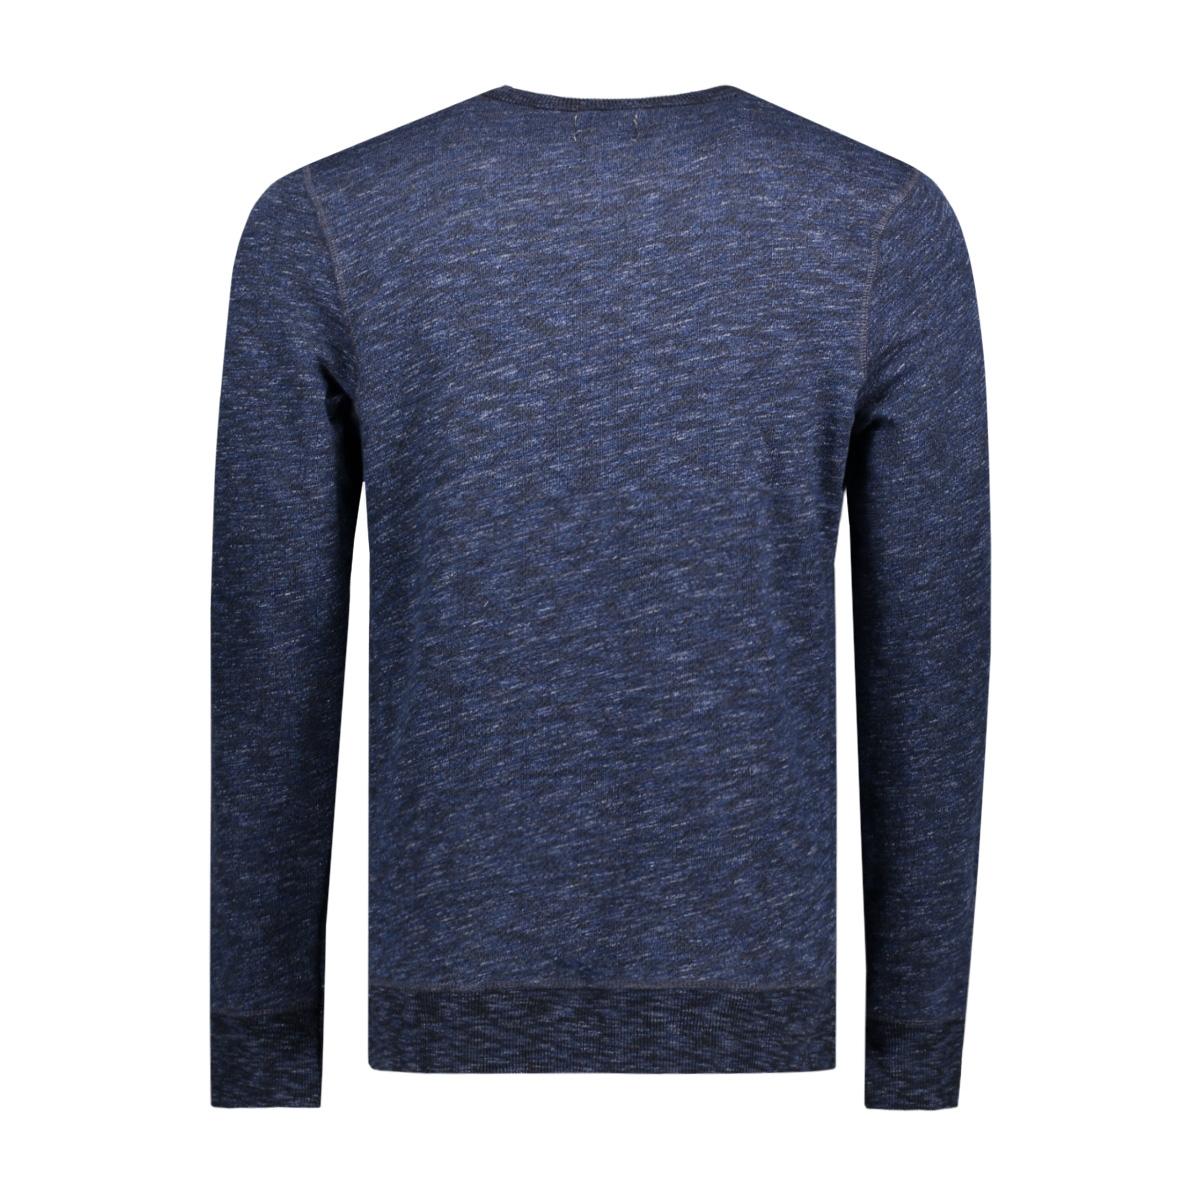 jjvrugged melange sweat crew neck noos 12127405 jack & jones sweater mood indigo